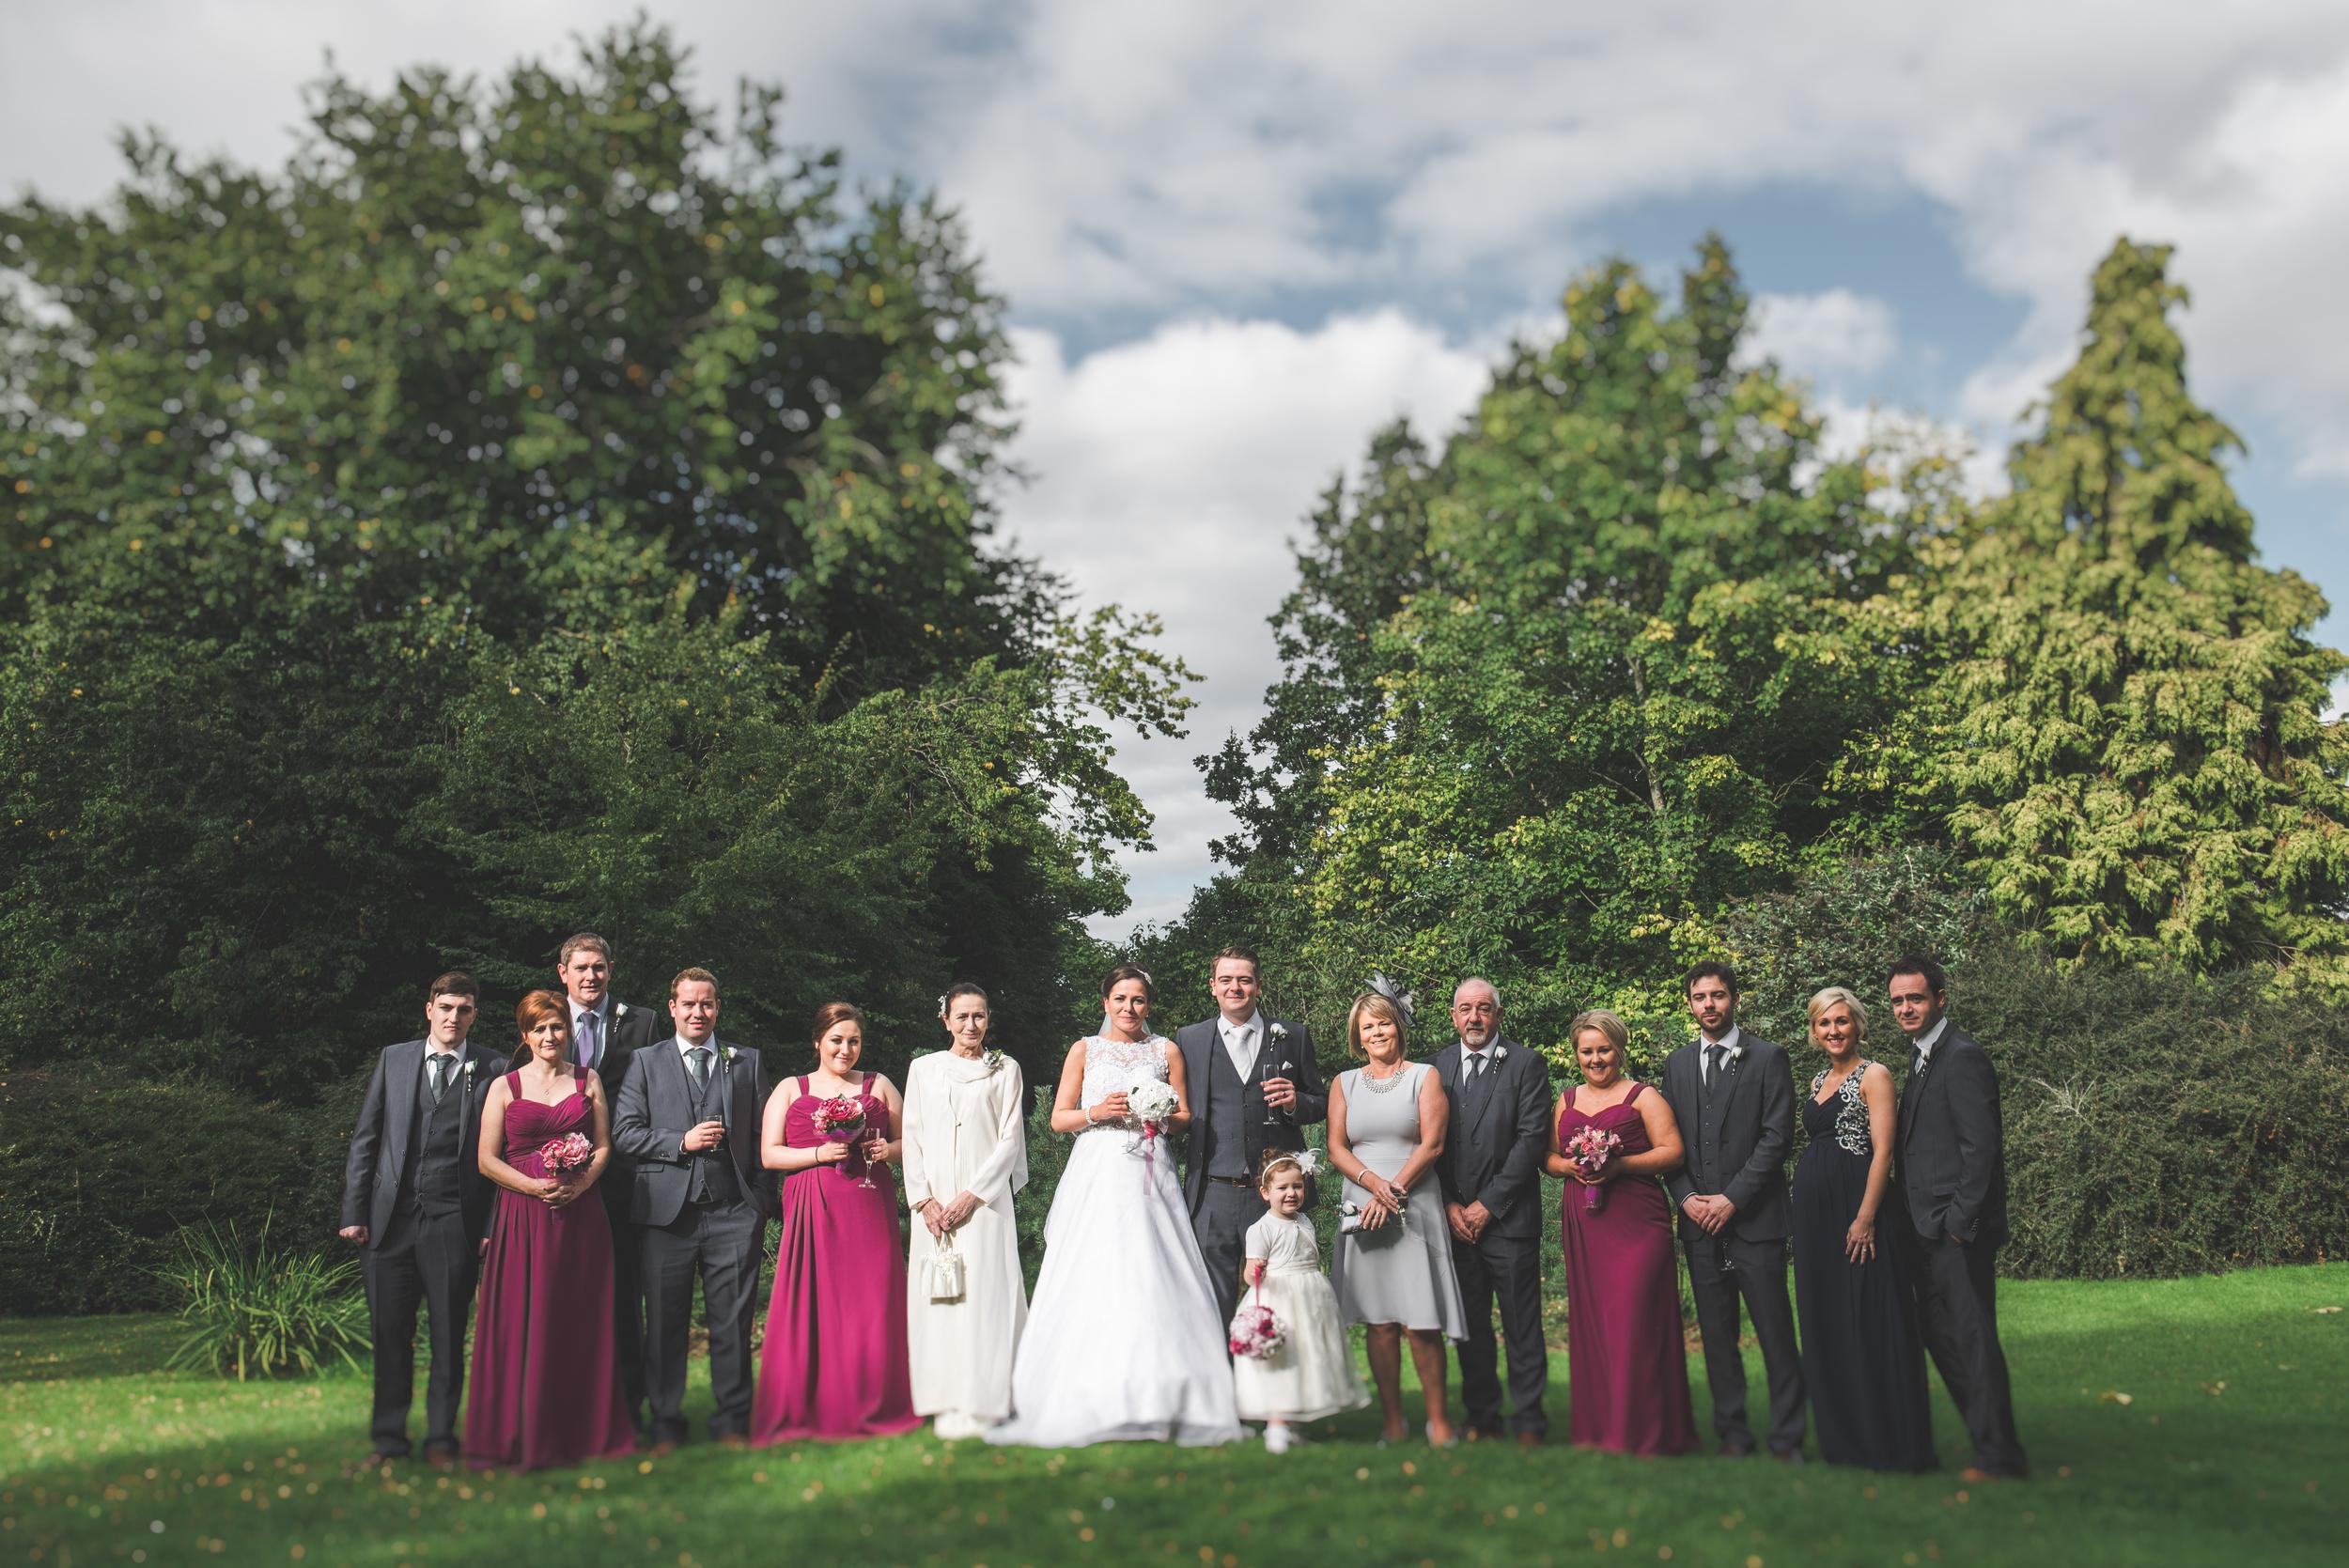 Belfast_Wedding_Photographer_Purephotoni_Musgrave_Park_Group_Photograph